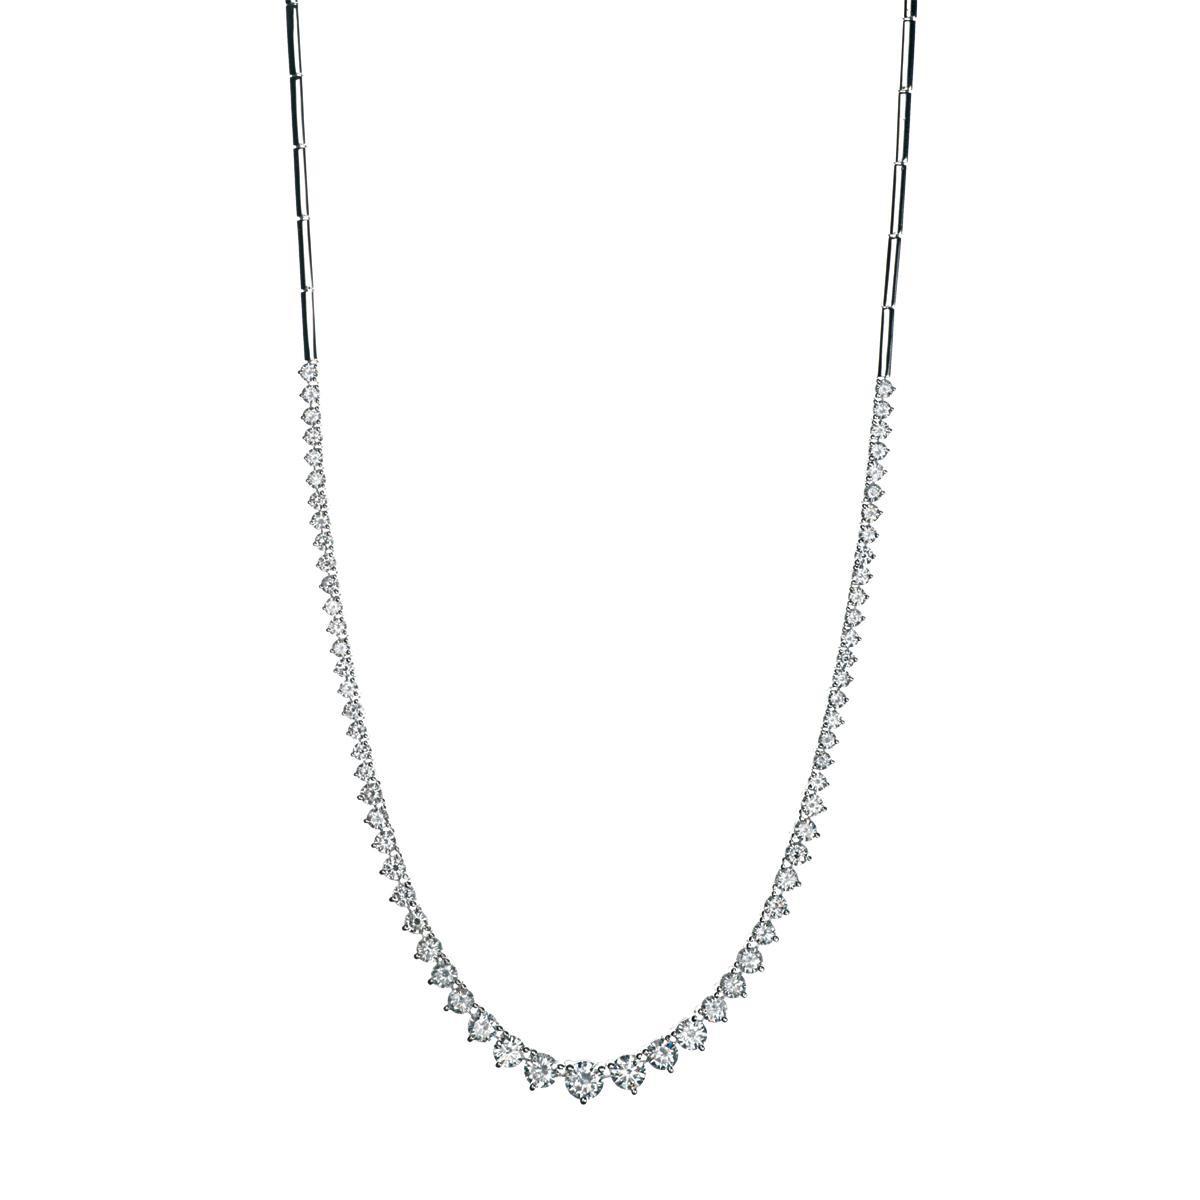 New 4.51 CTW Diamond Tennis Necklace